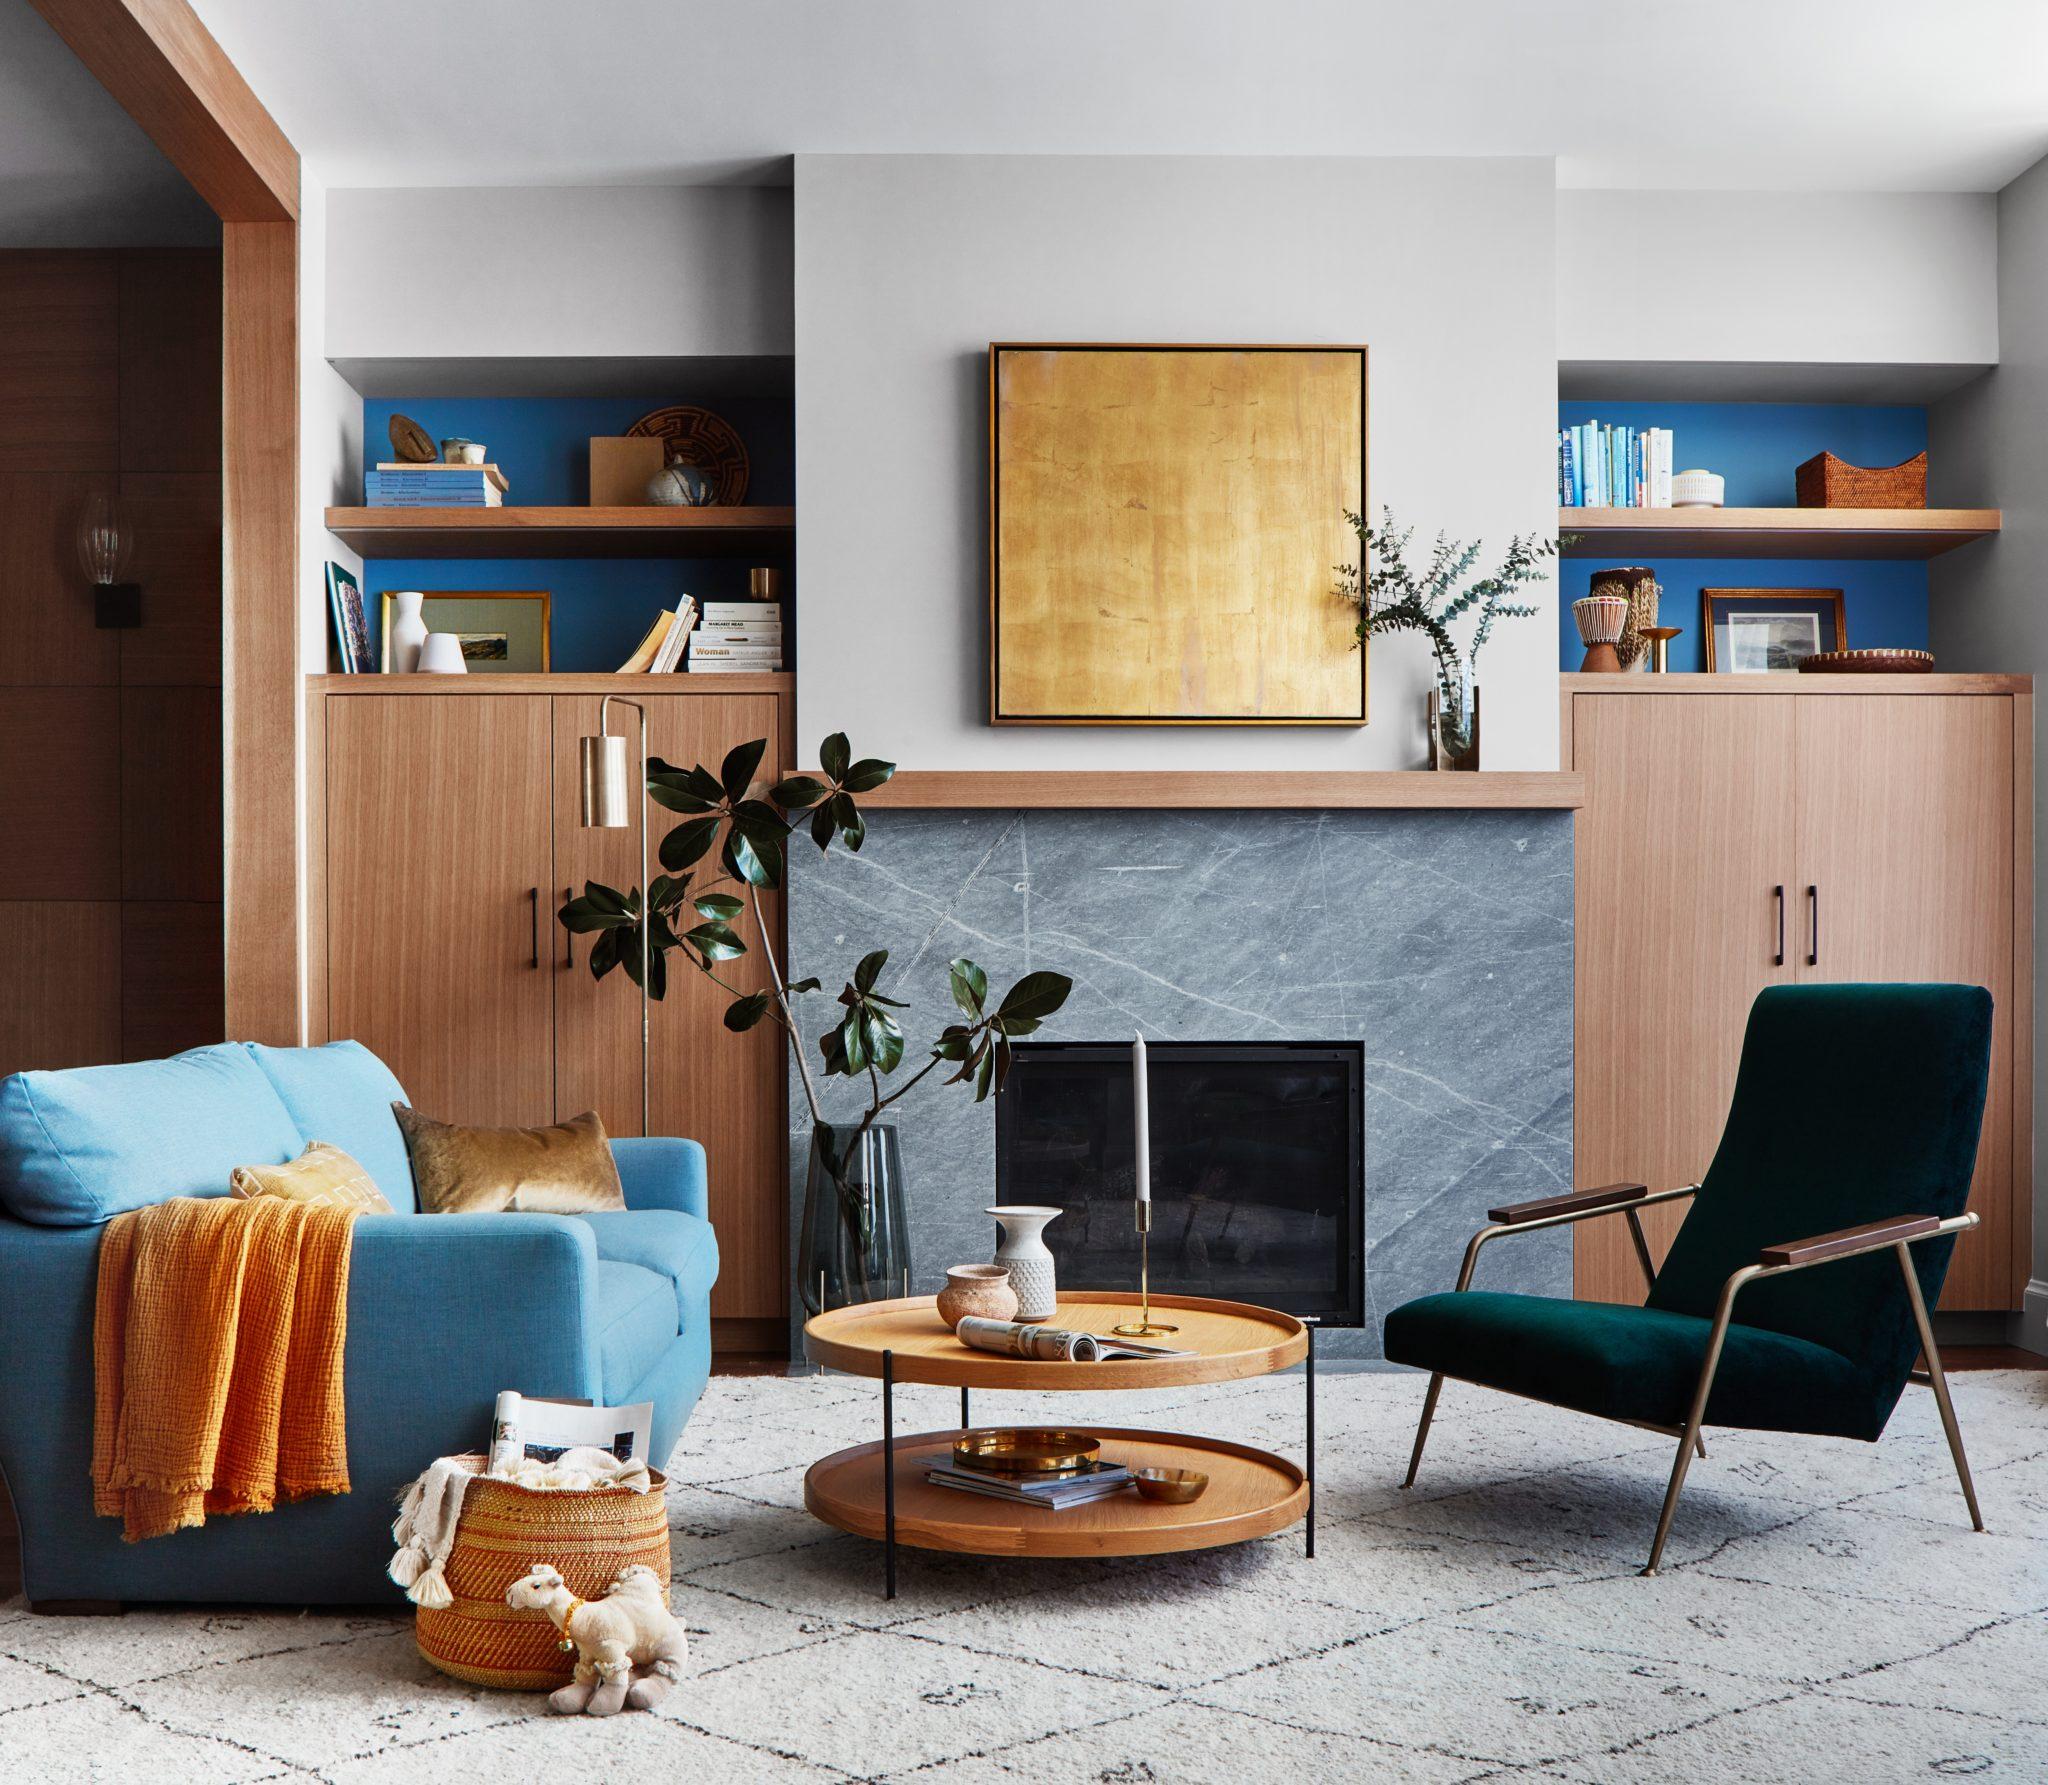 25th Street - Living Room by Staprans Design